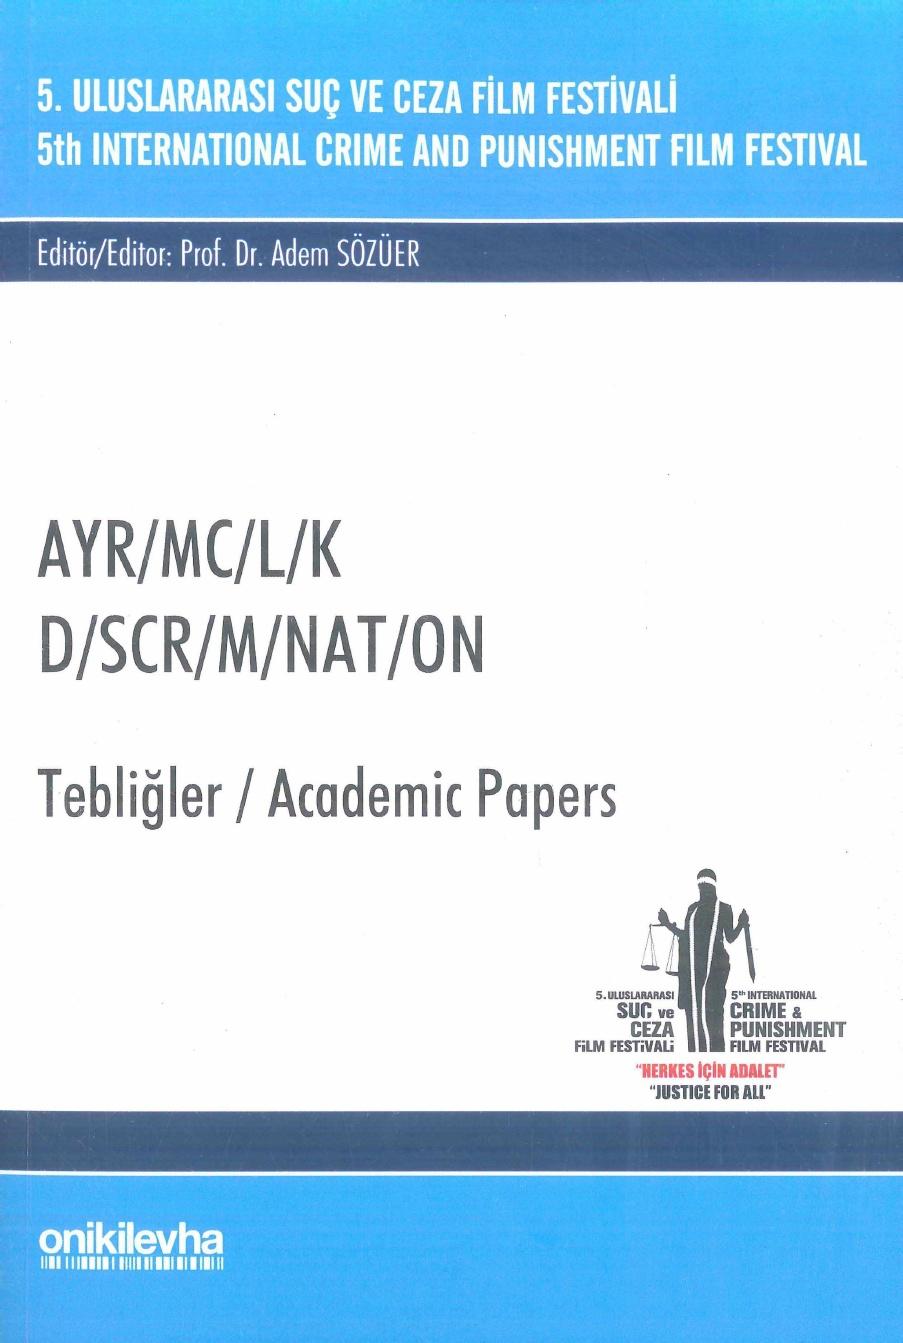 Academic Papers Soezuer.jpg